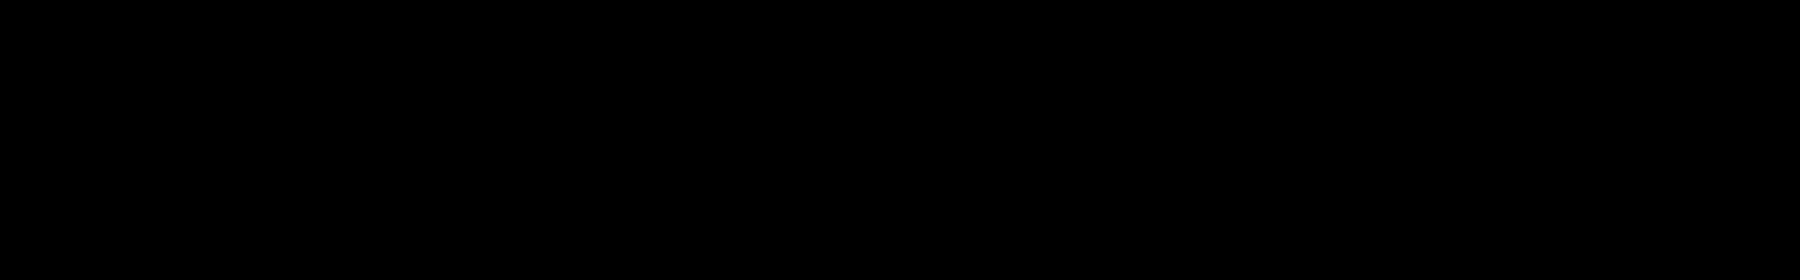 Leviathan audio waveform